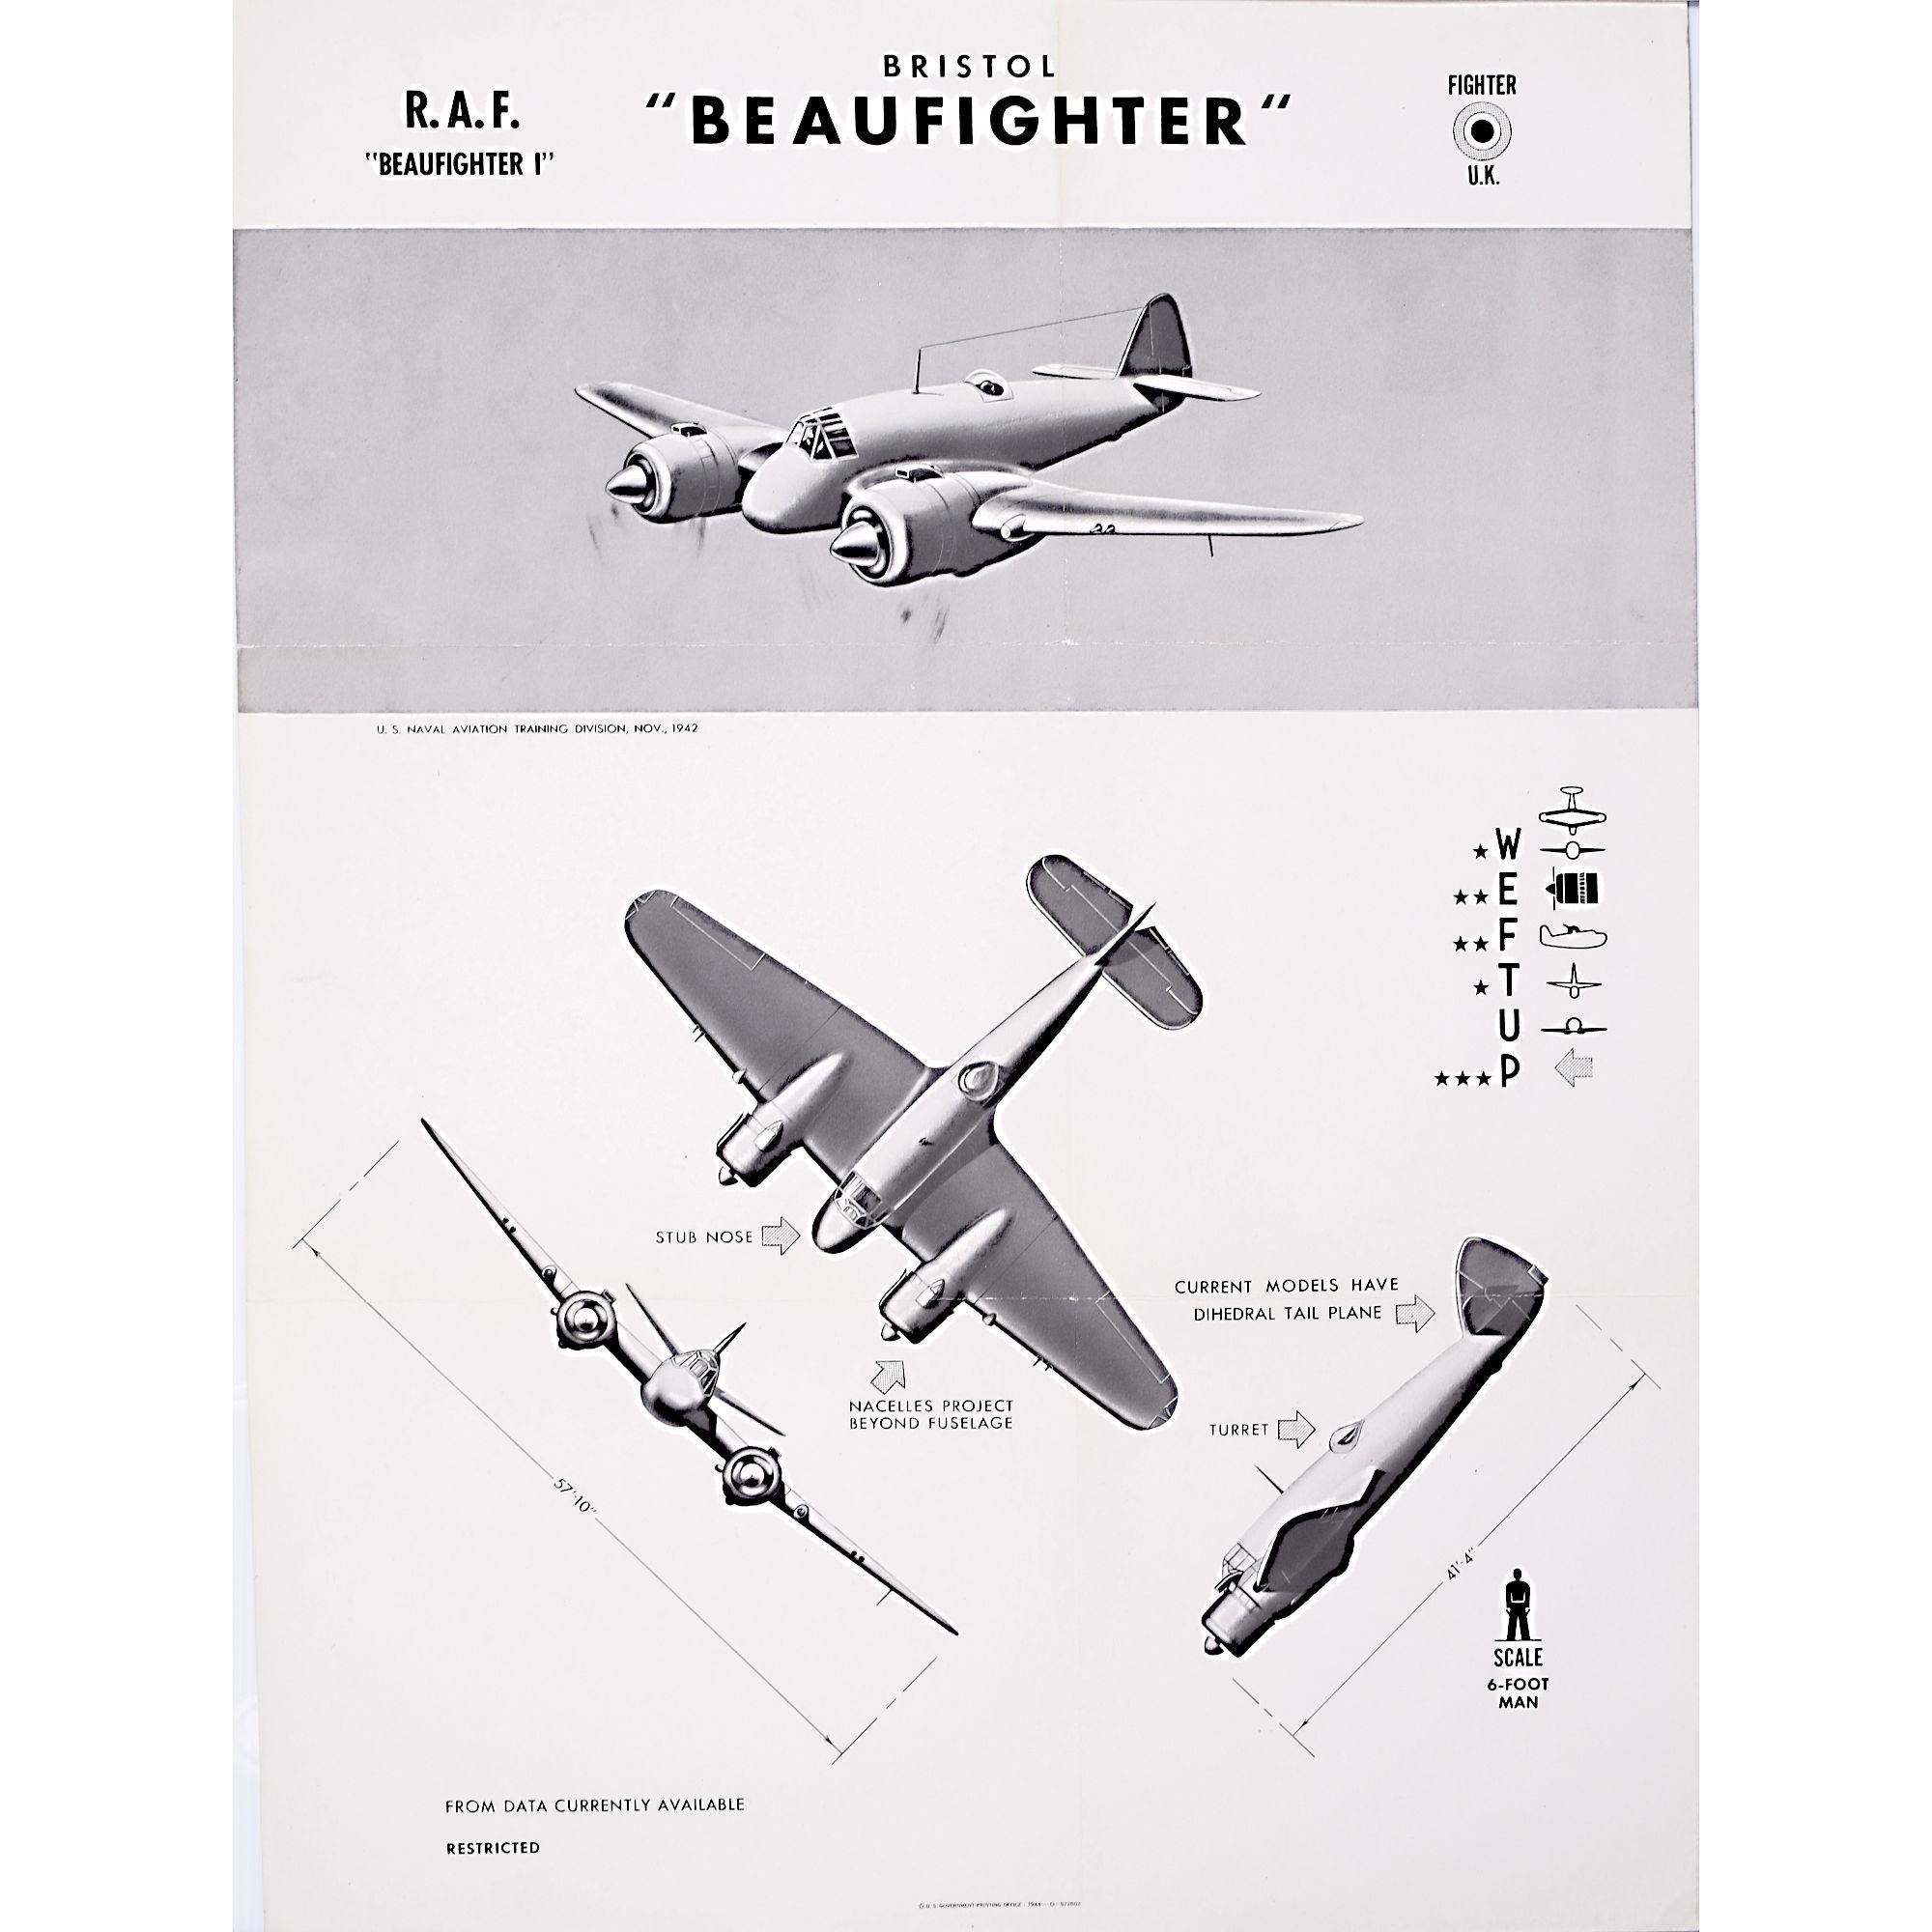 Bristol Beaufighter WW2 original aircraft recognition poster